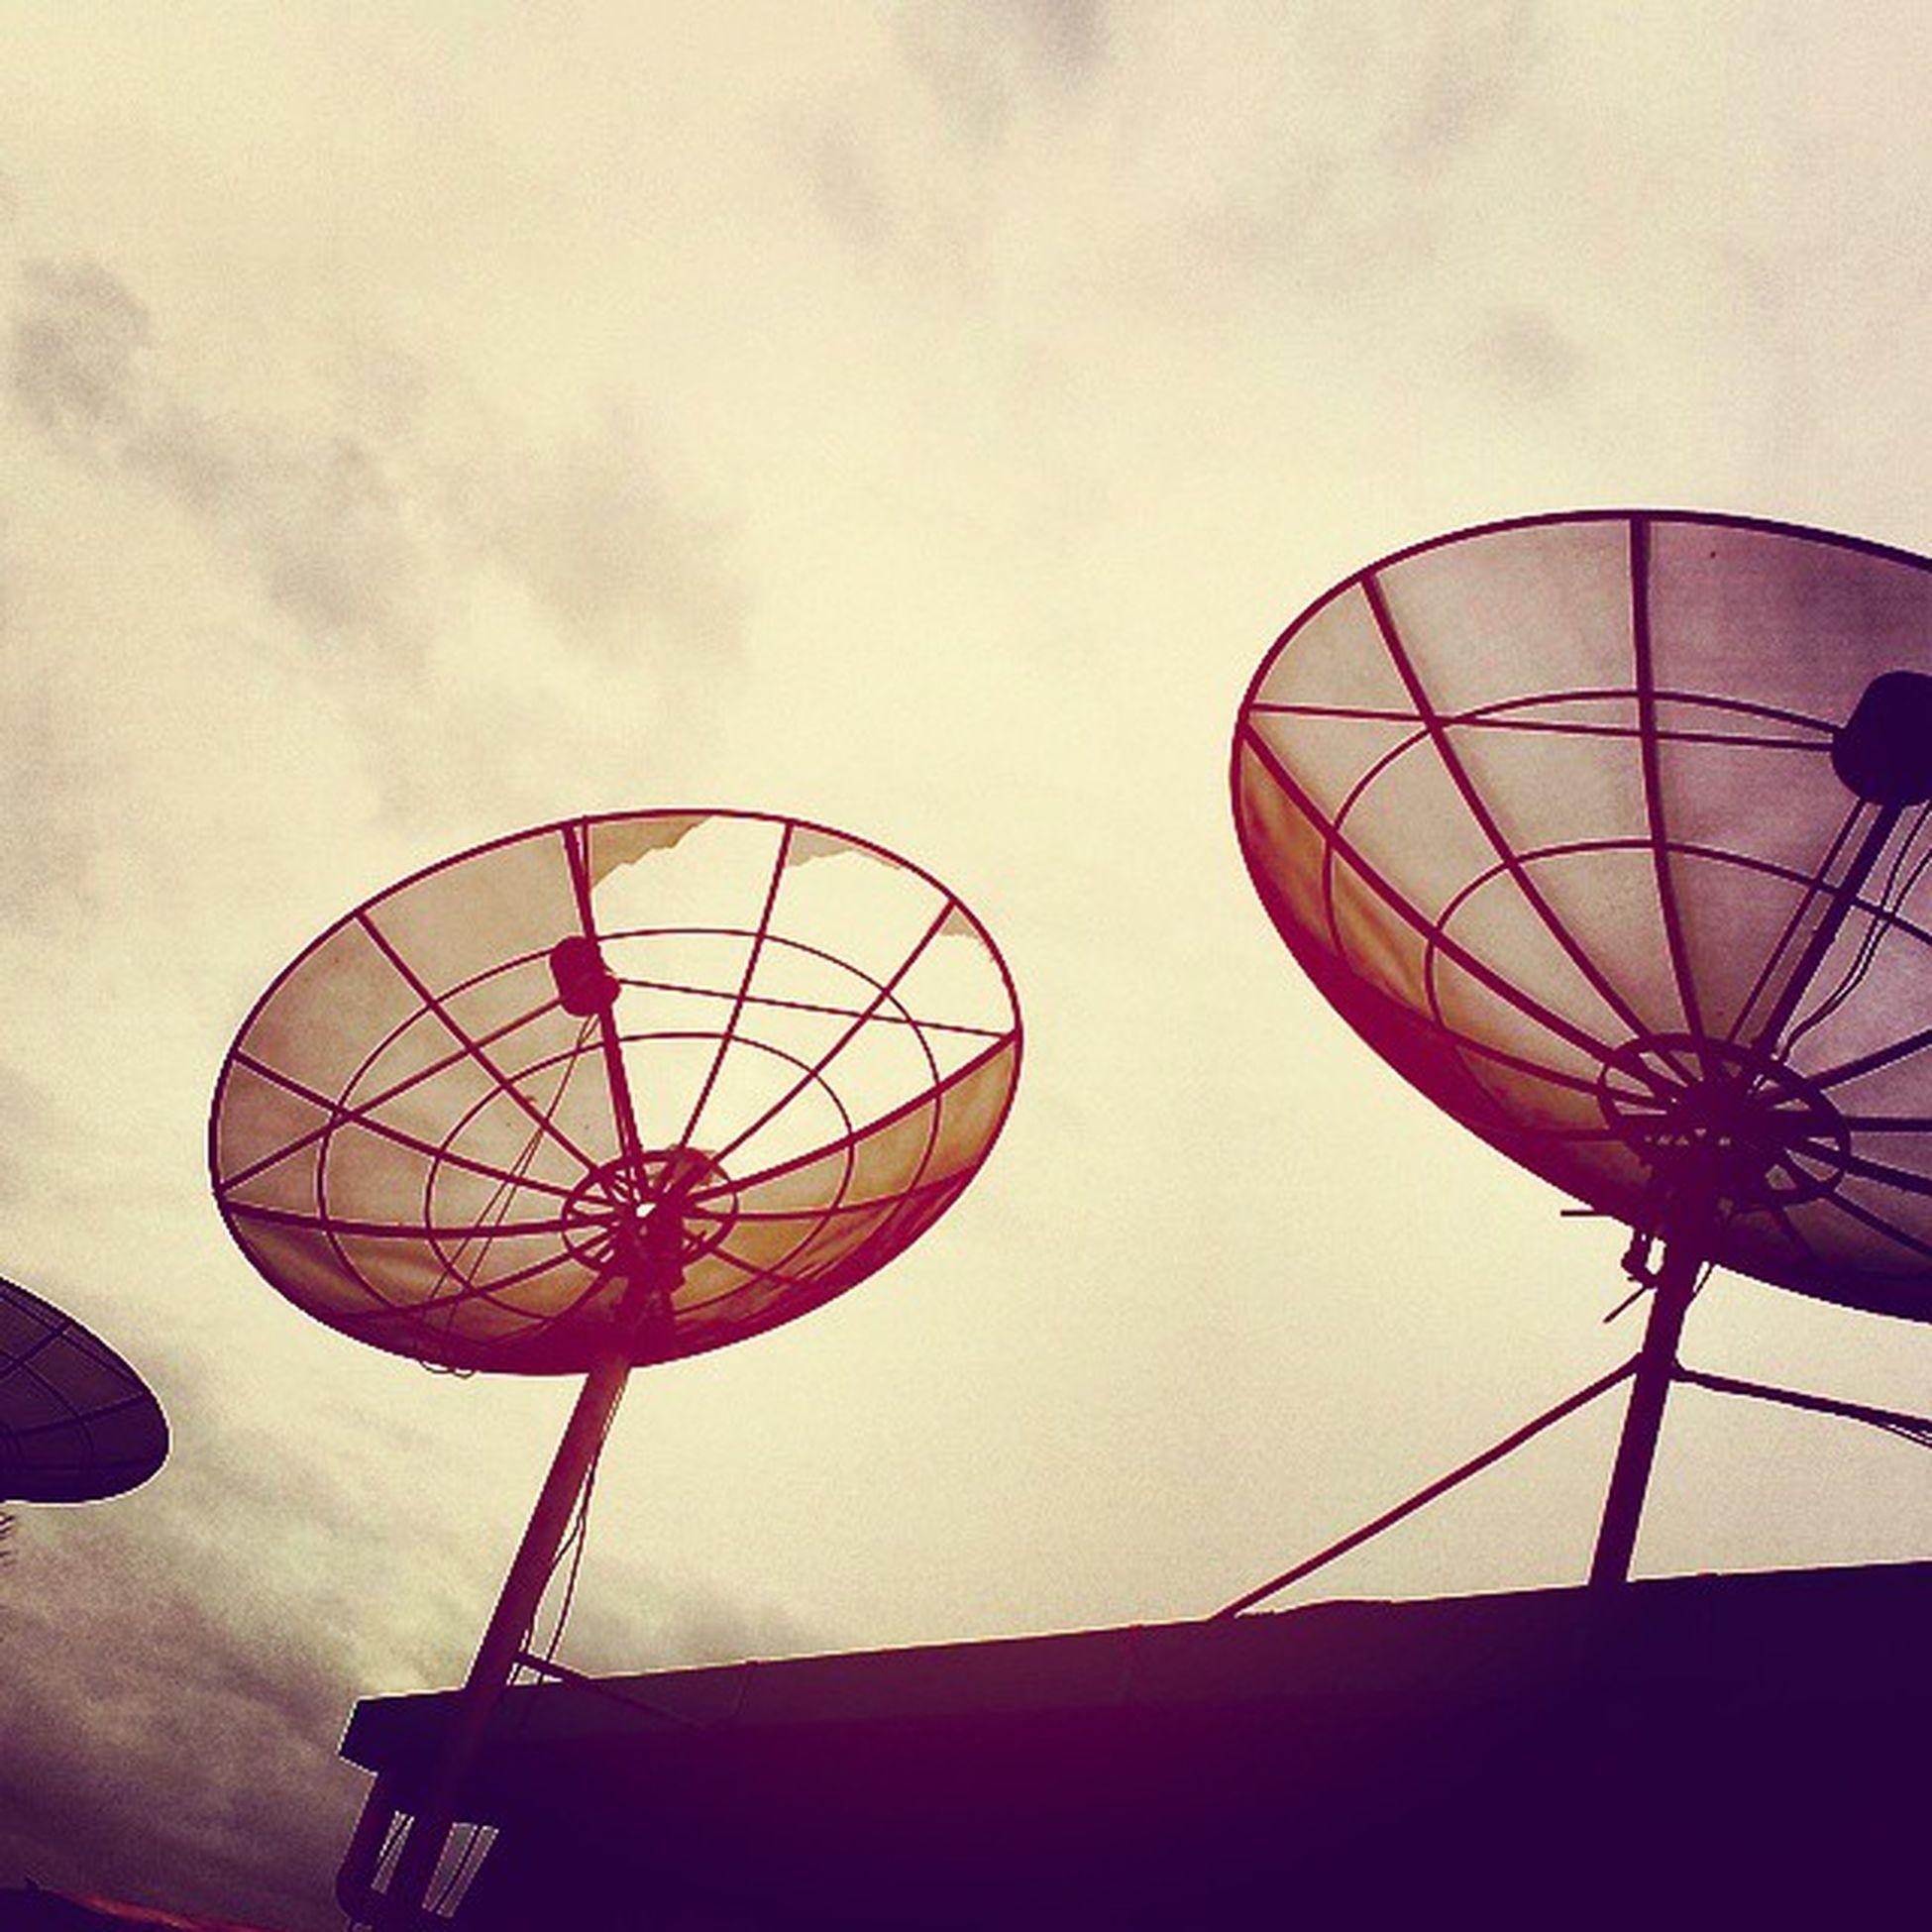 Dish Antanae Network CableTV VM